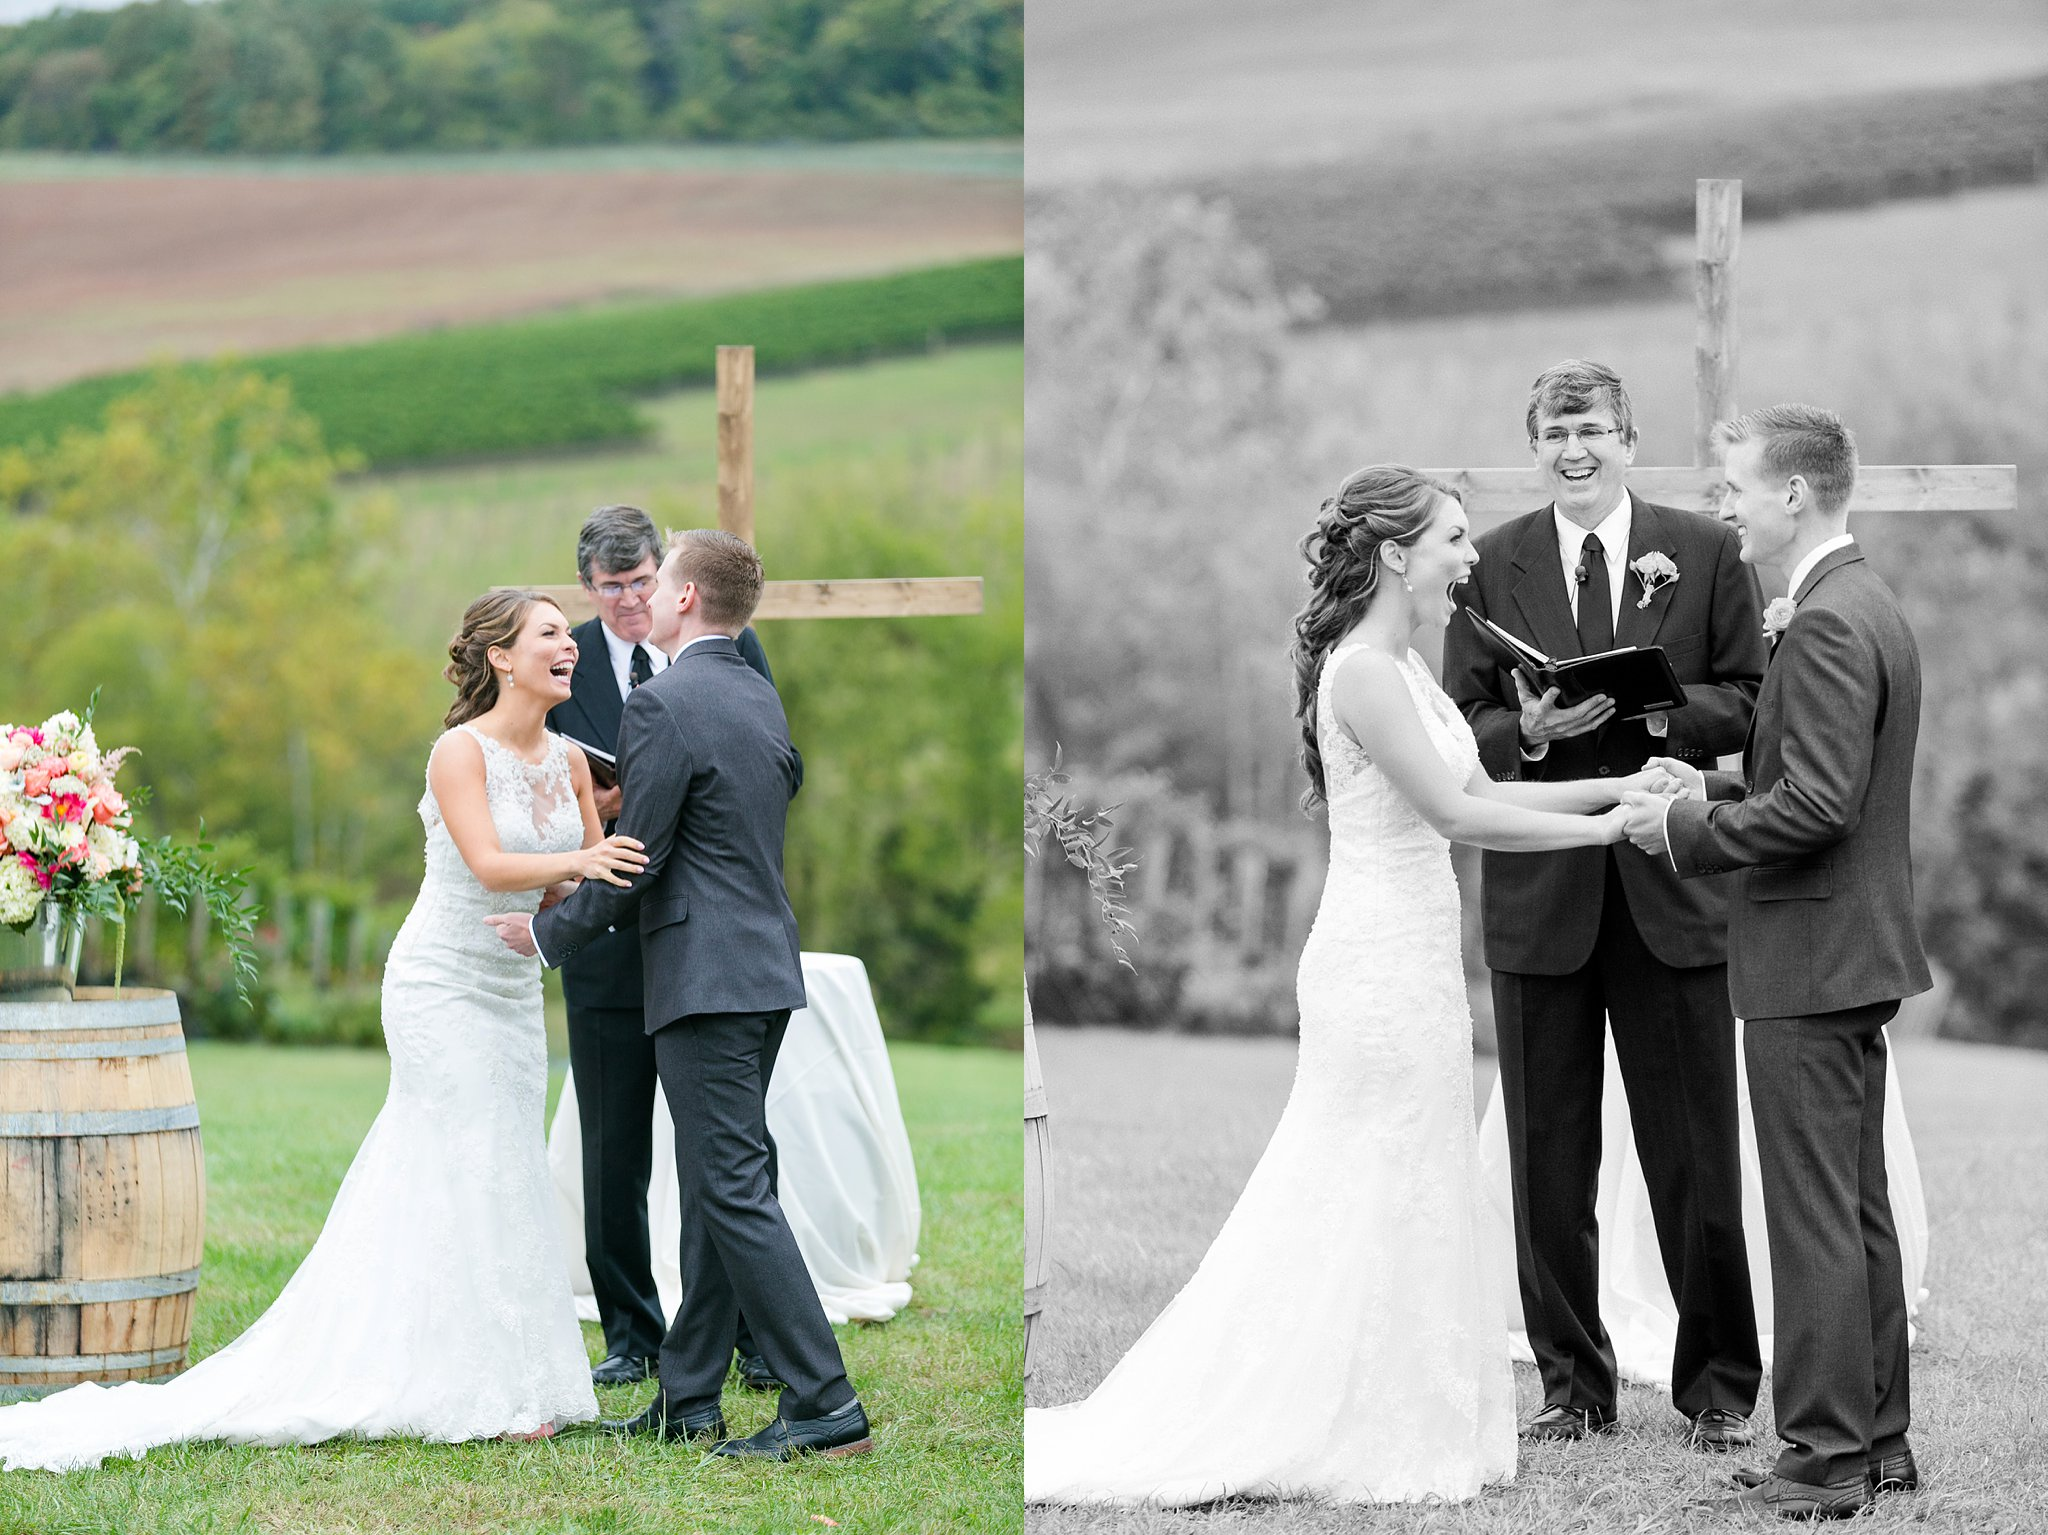 Stone Tower Winery Wedding Photos Virginia Wedding Photographer Megan Kelsey Photography Sam & Angela-161.jpg